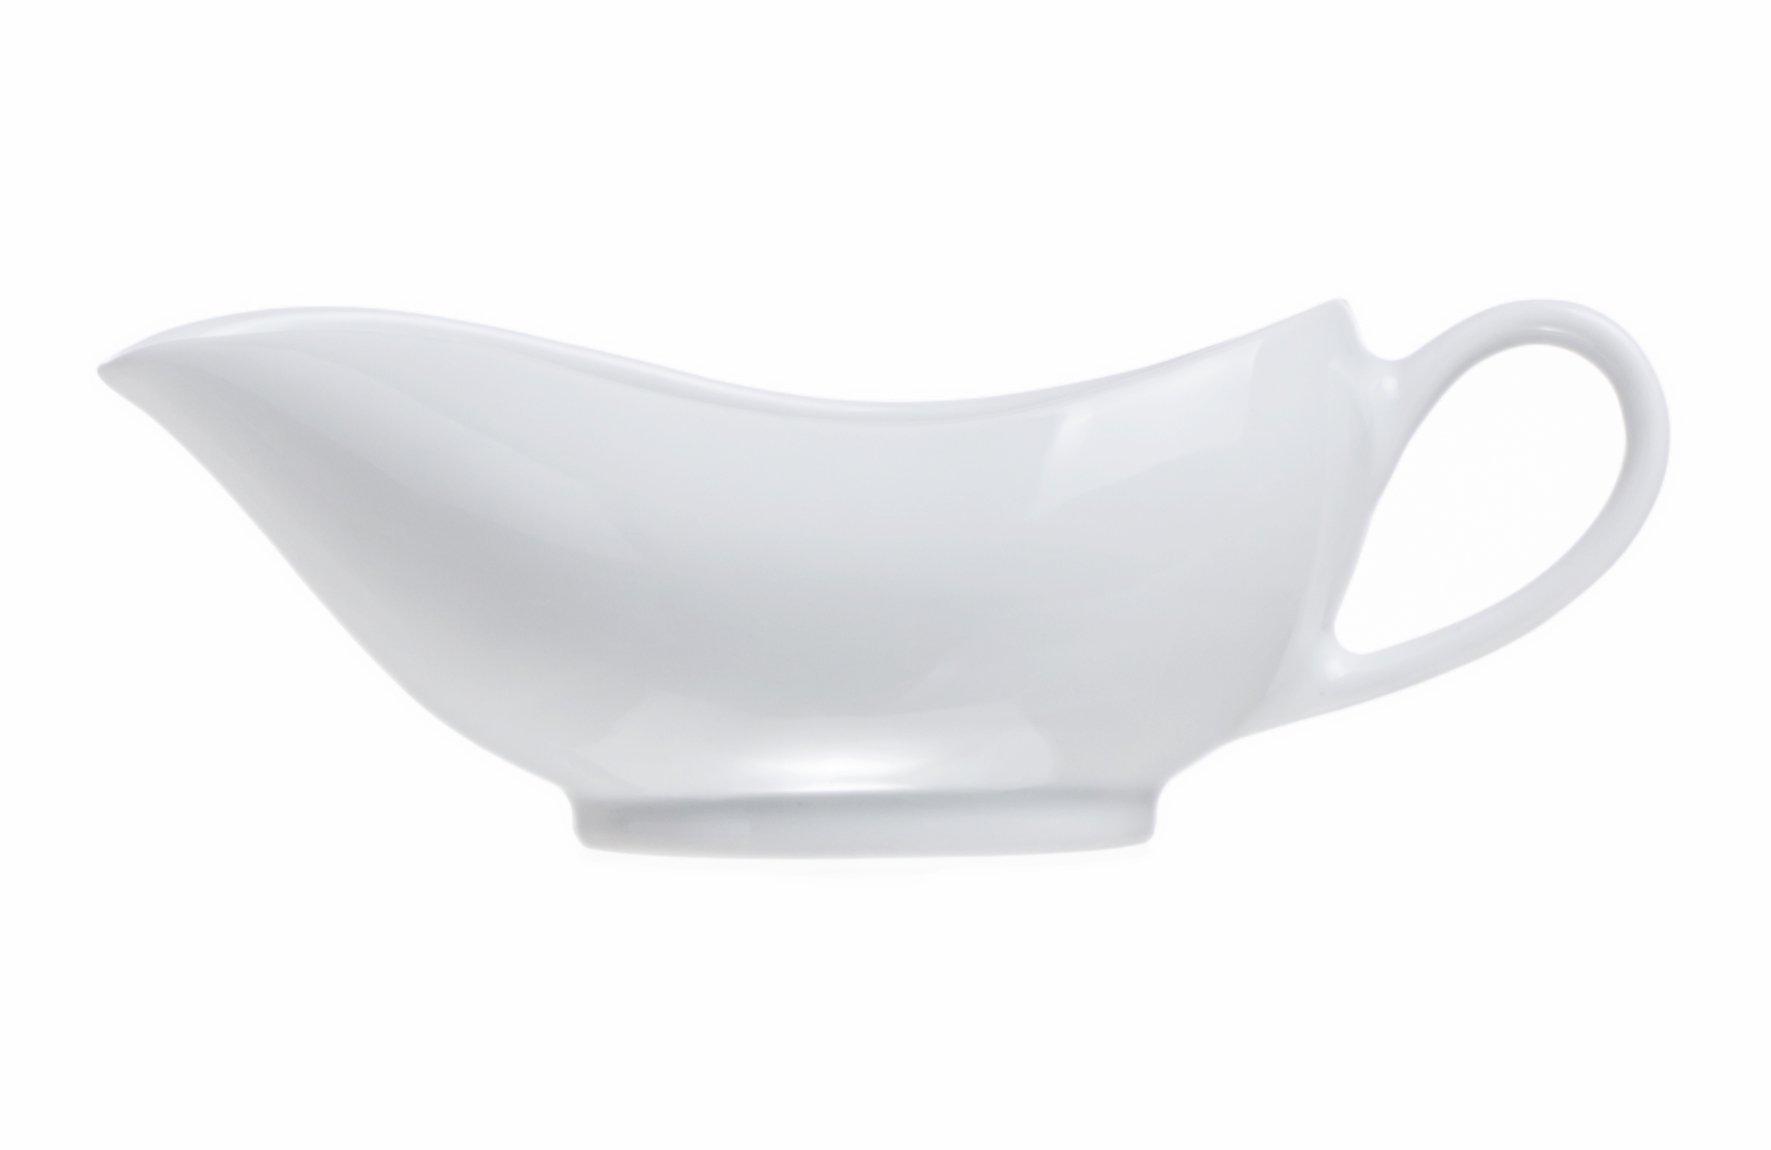 4-Piece Porcelain 5 Oz Classic Gravy Suace Boat, Restaurant&Hotel Quality